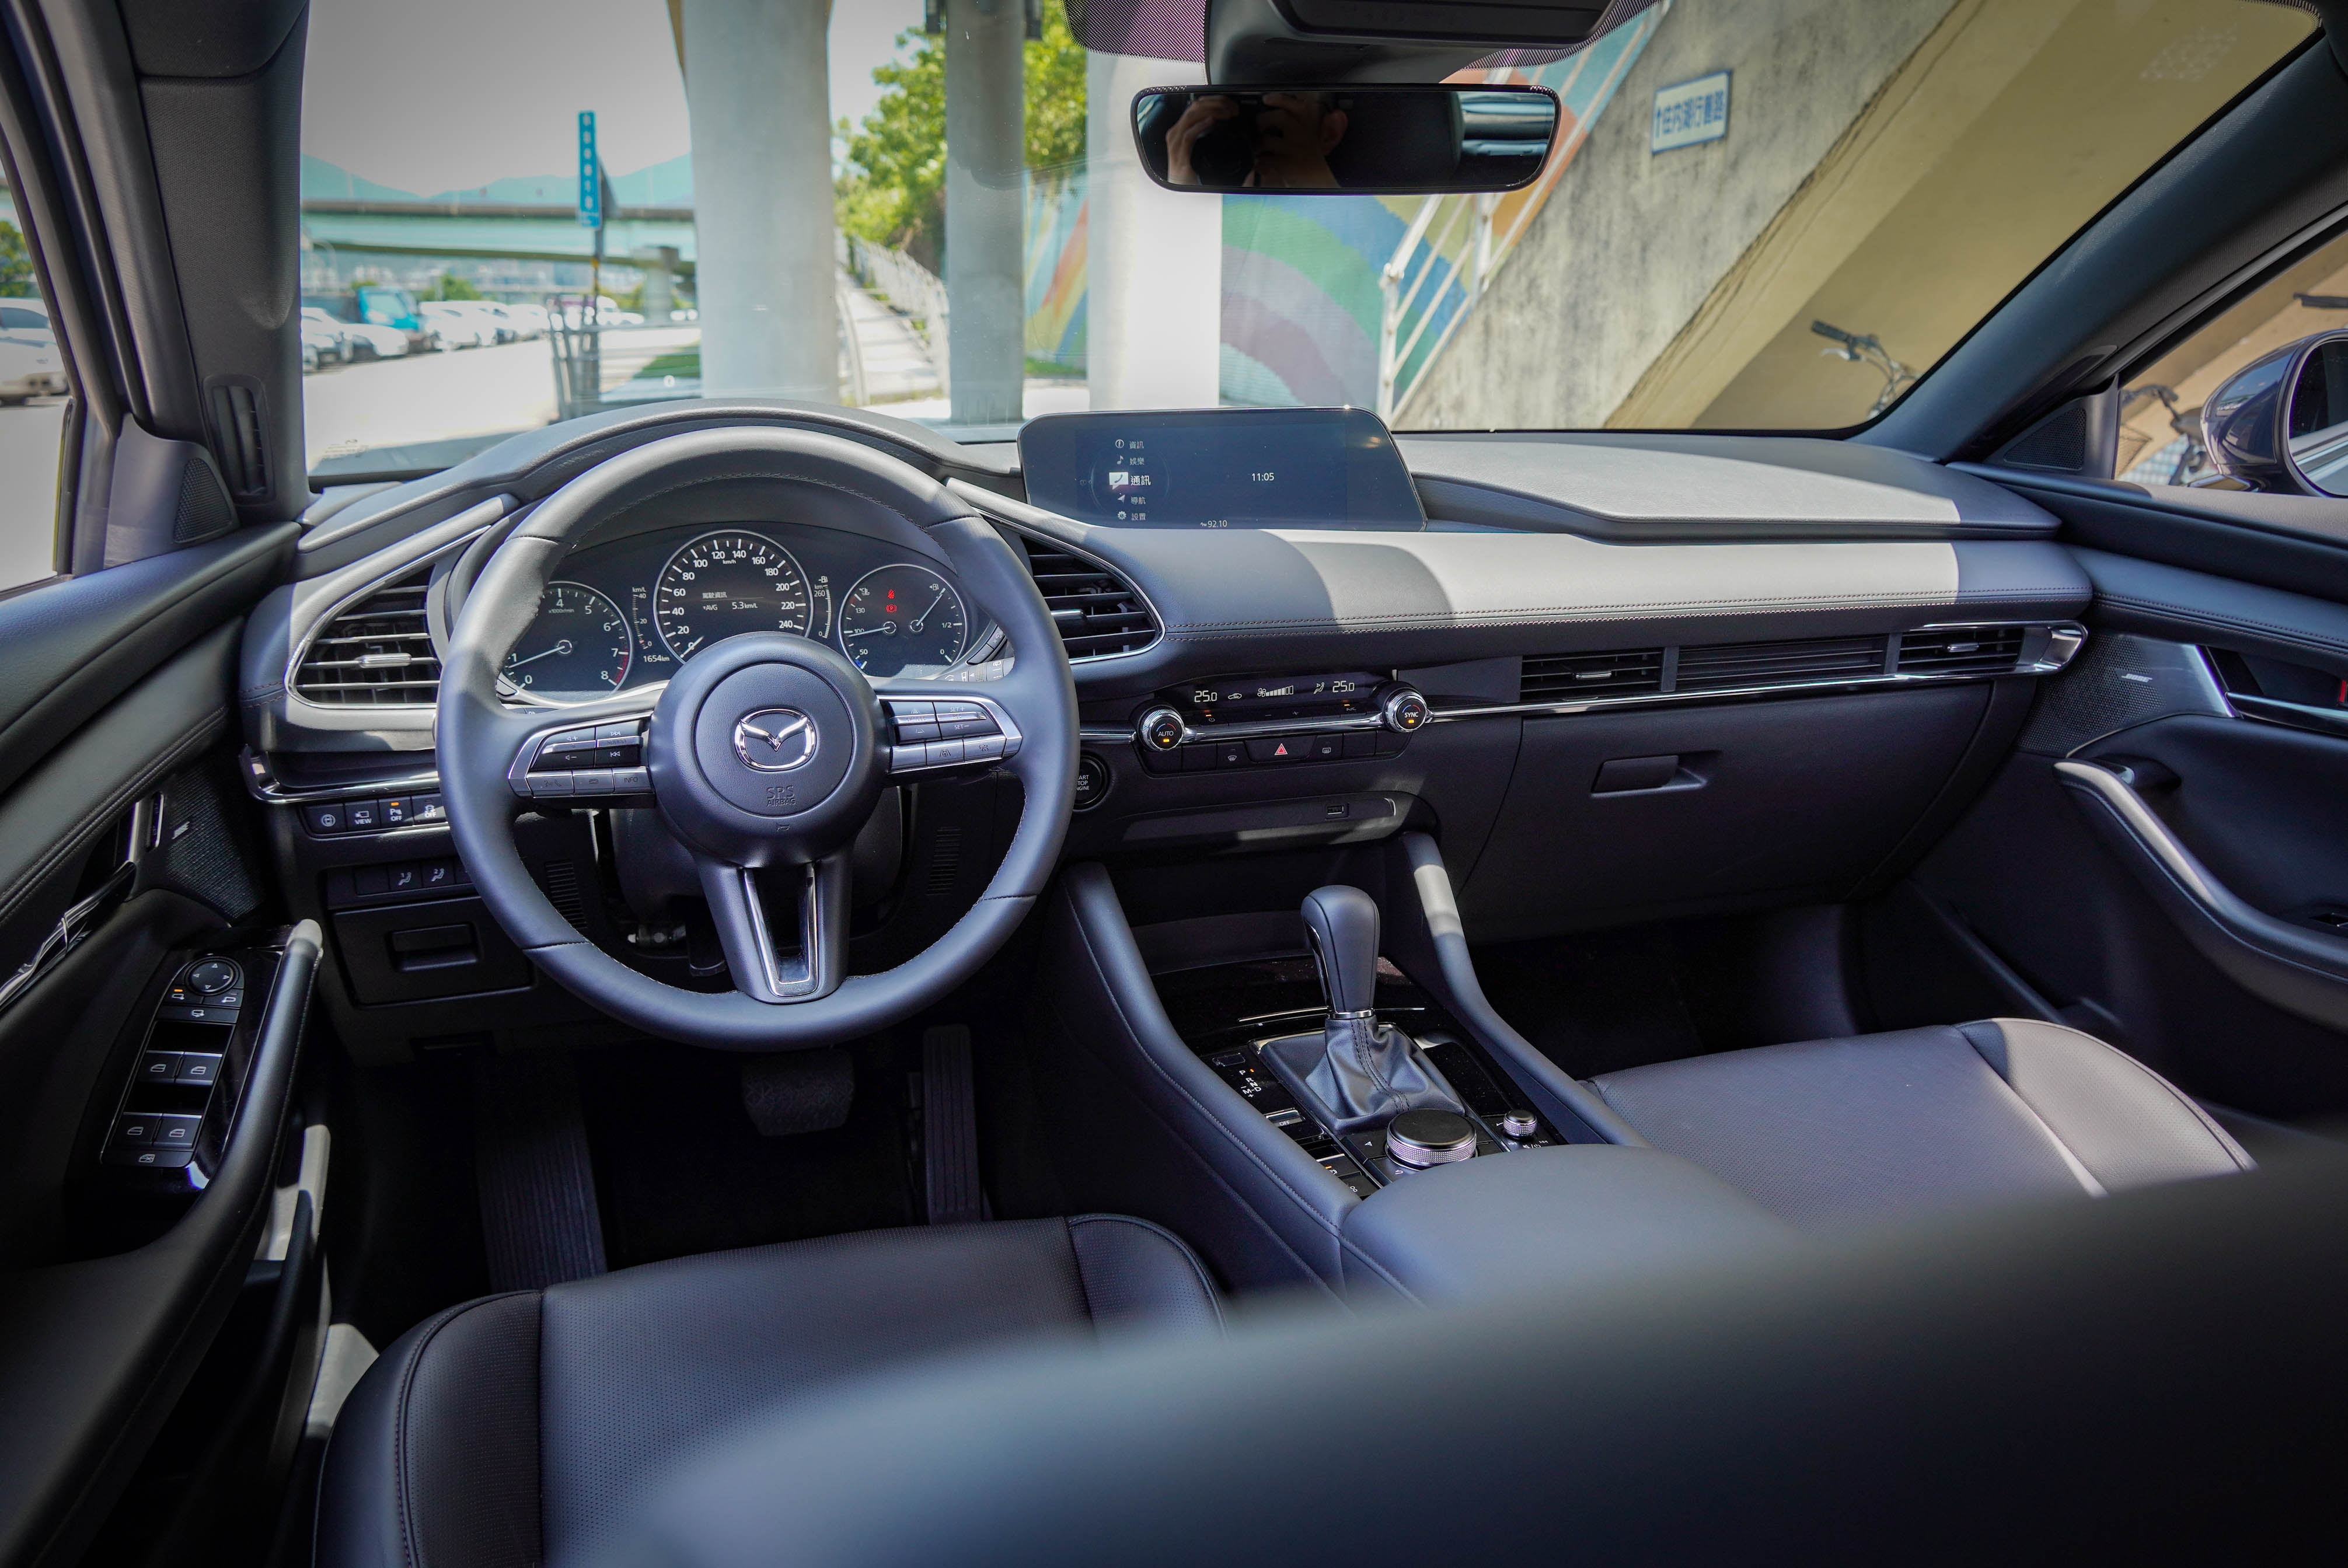 Mazda3 內裝標配 7 吋全彩數位儀錶、雙區獨立恆溫空調系統、Mazda Harmonic Acoustics 環場聲學音響系統、8.8 吋中央資訊顯示幕等科技。